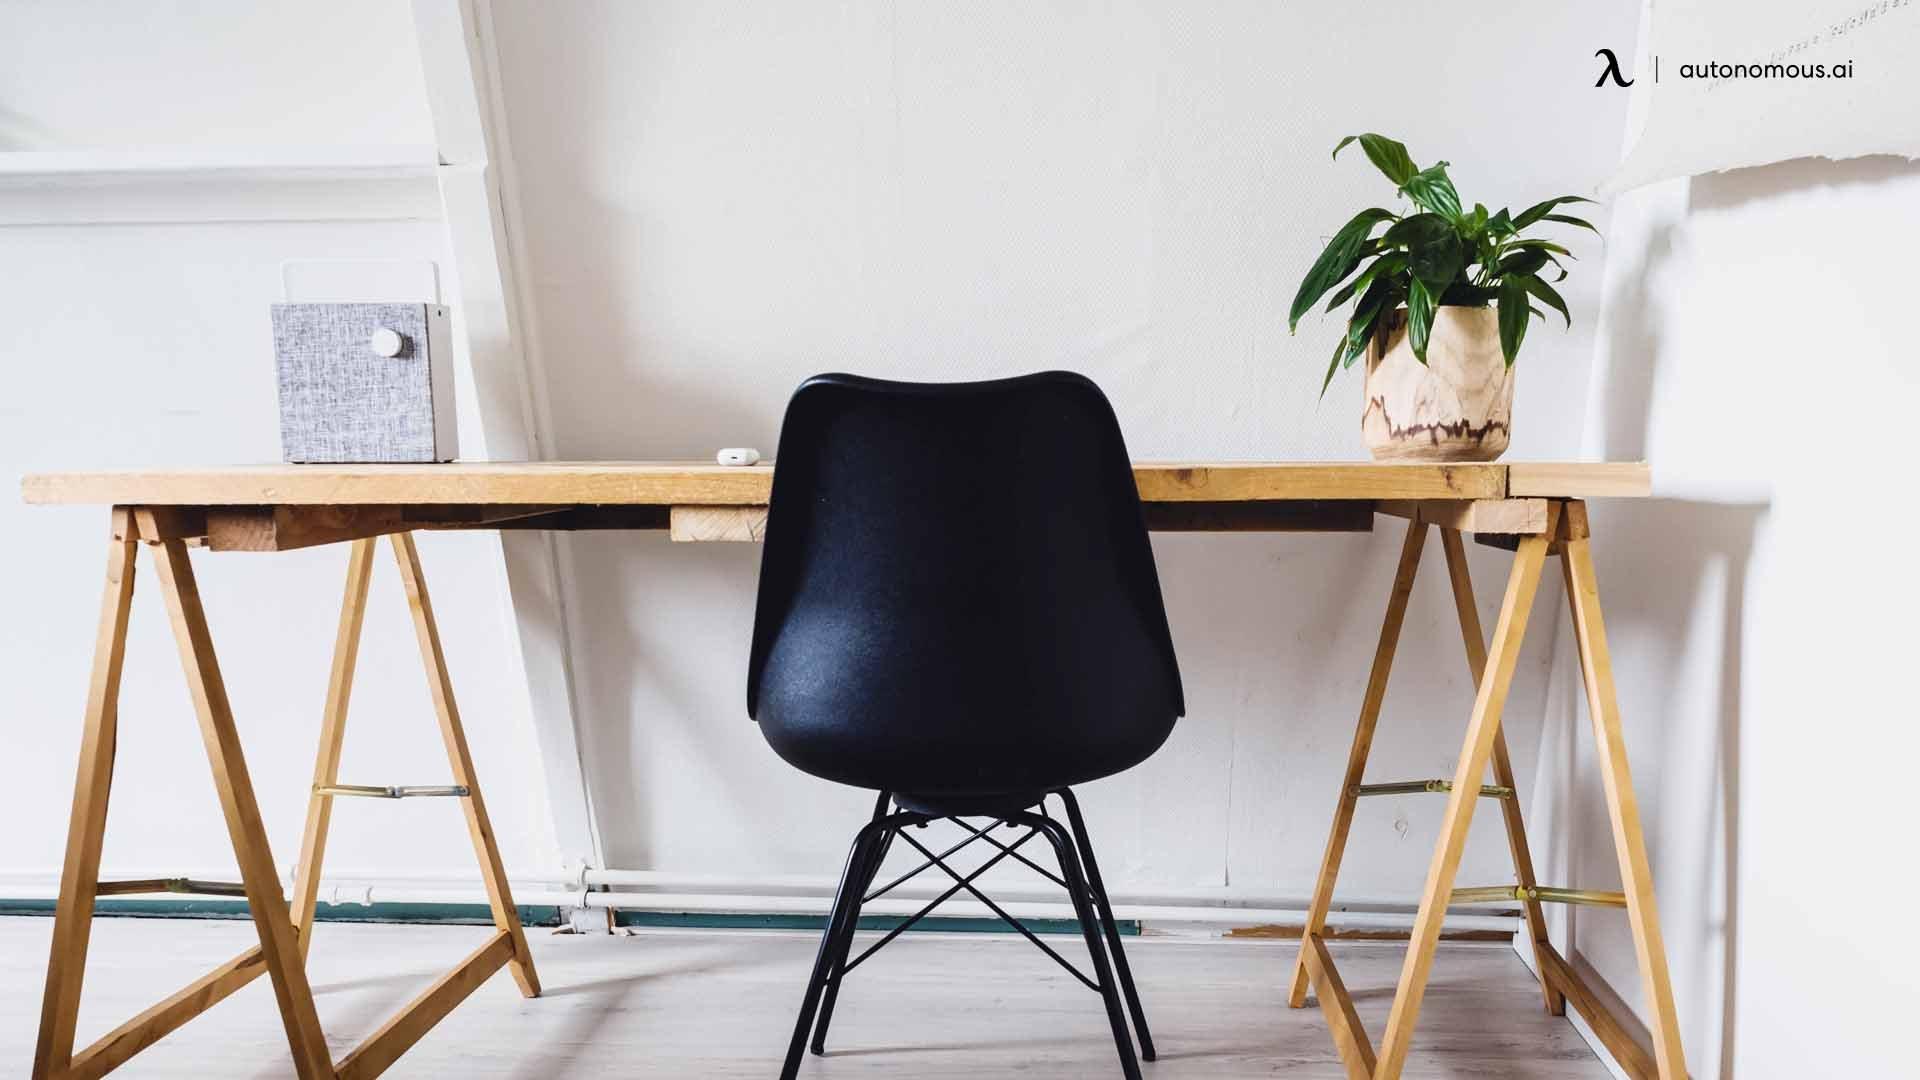 Reconsider your furniture arrangement